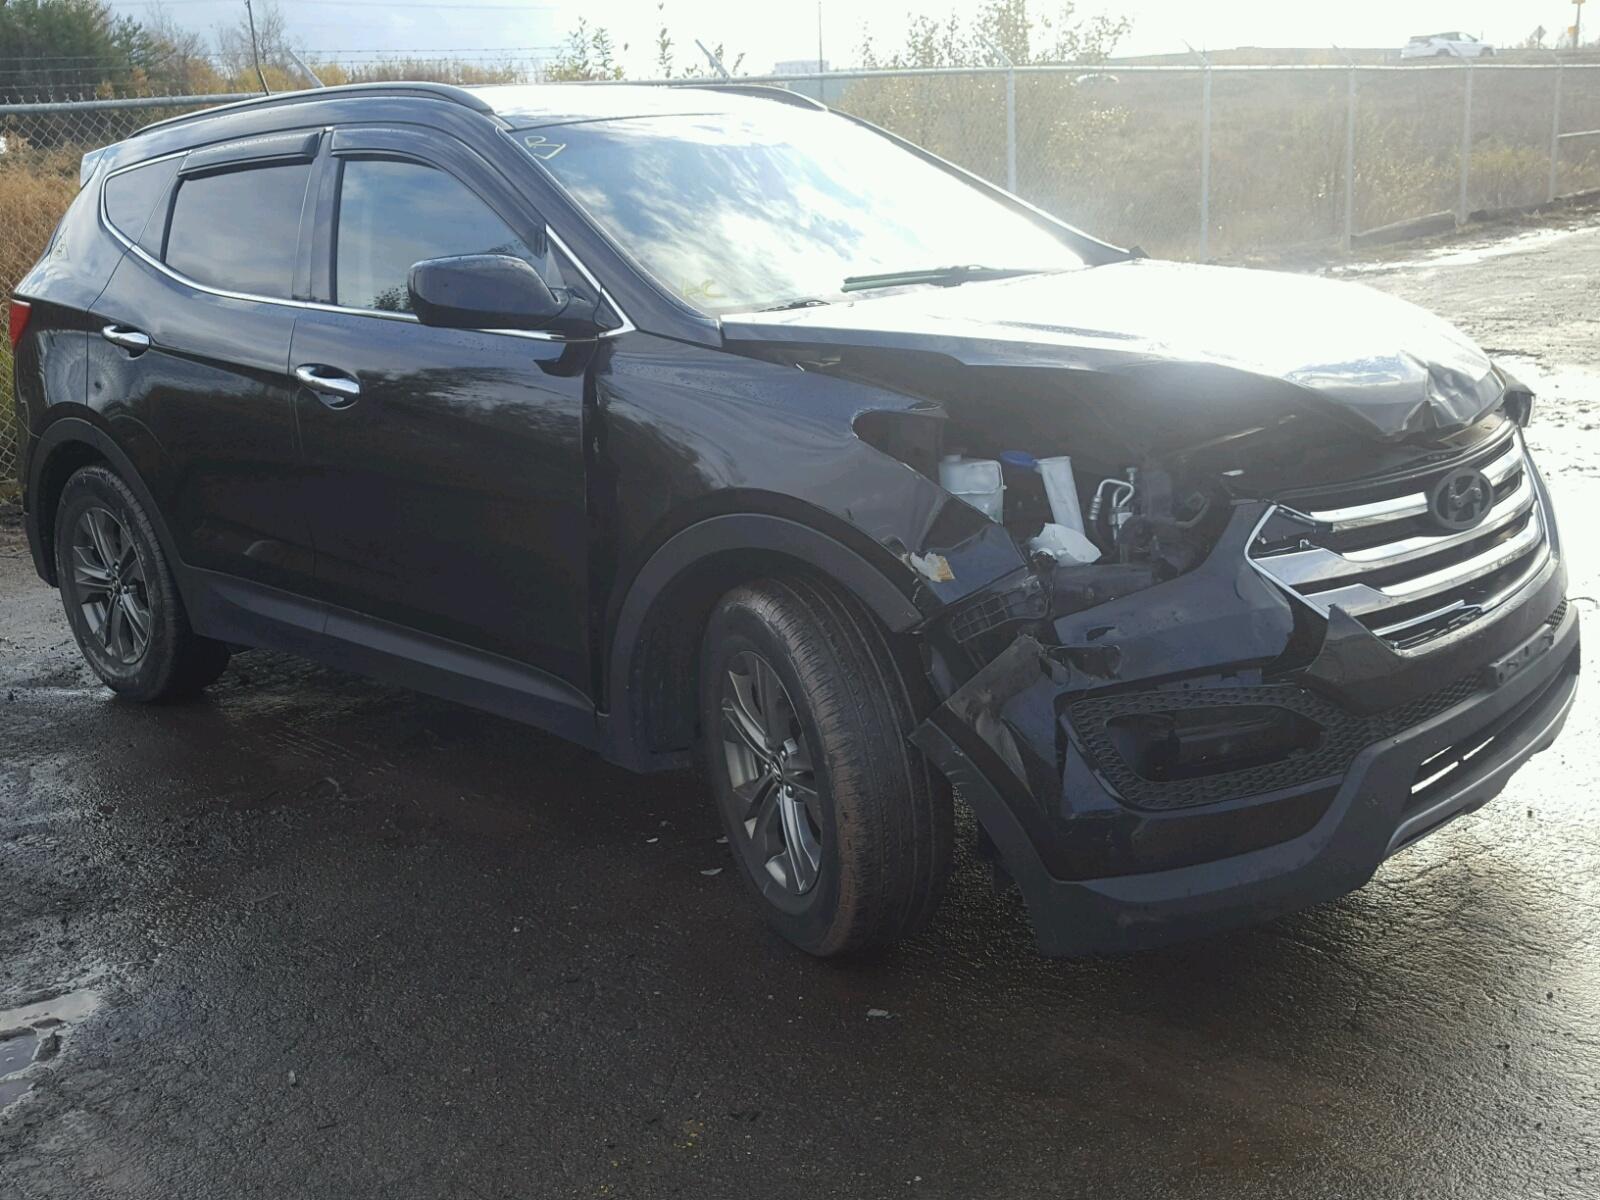 Salvage 2014 Hyundai SANTA FE S for sale